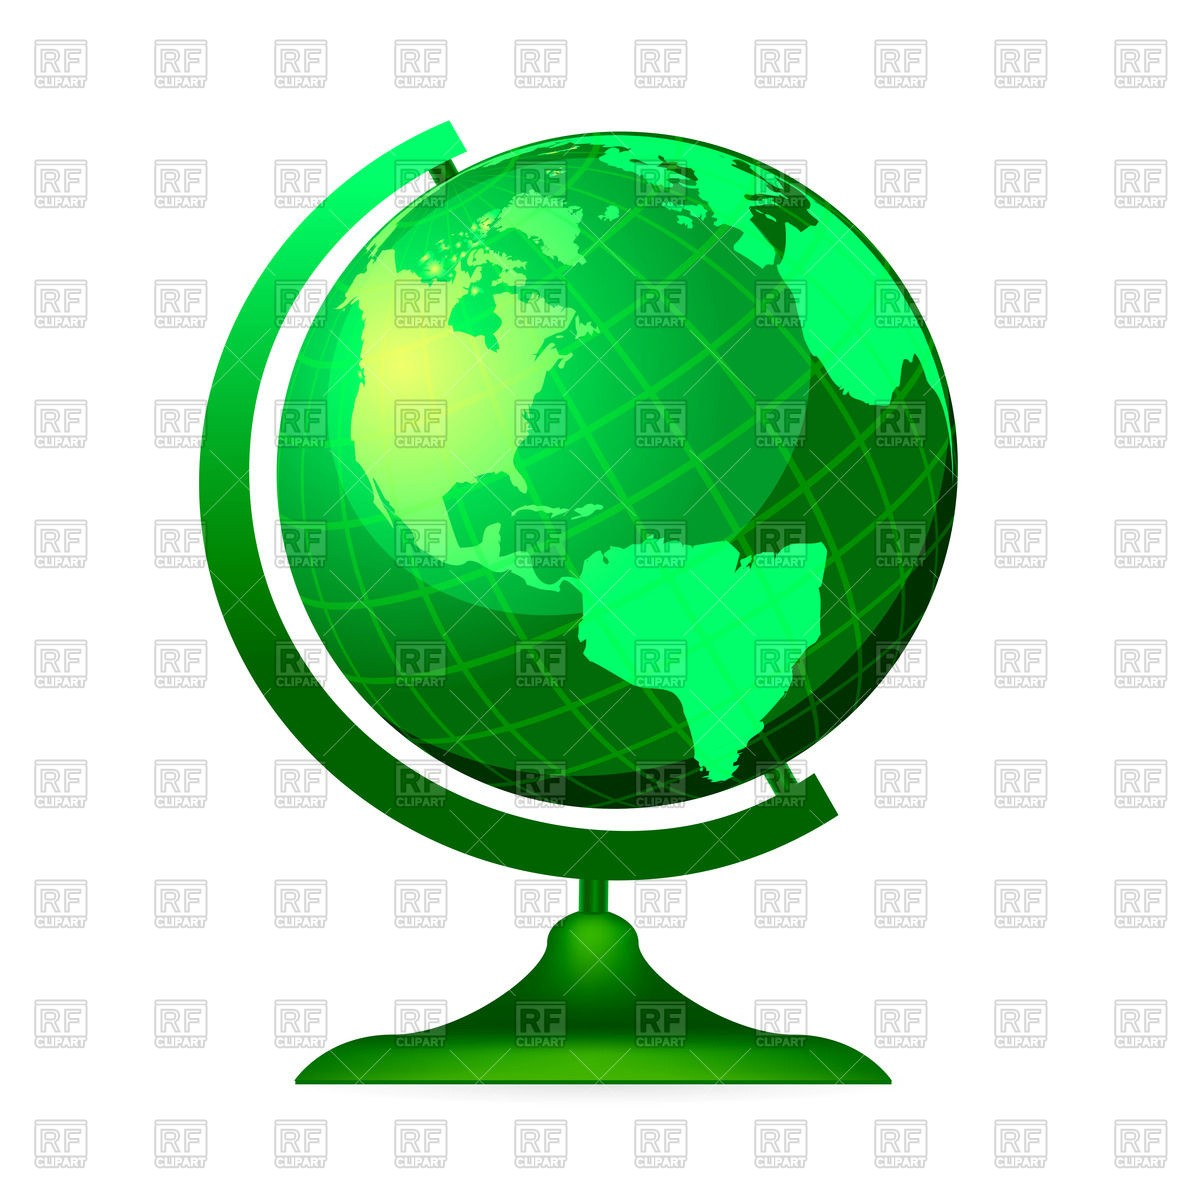 1200x1200 Green Globe Royalty Free Vector Clip Art Image 73370 Rfclipart